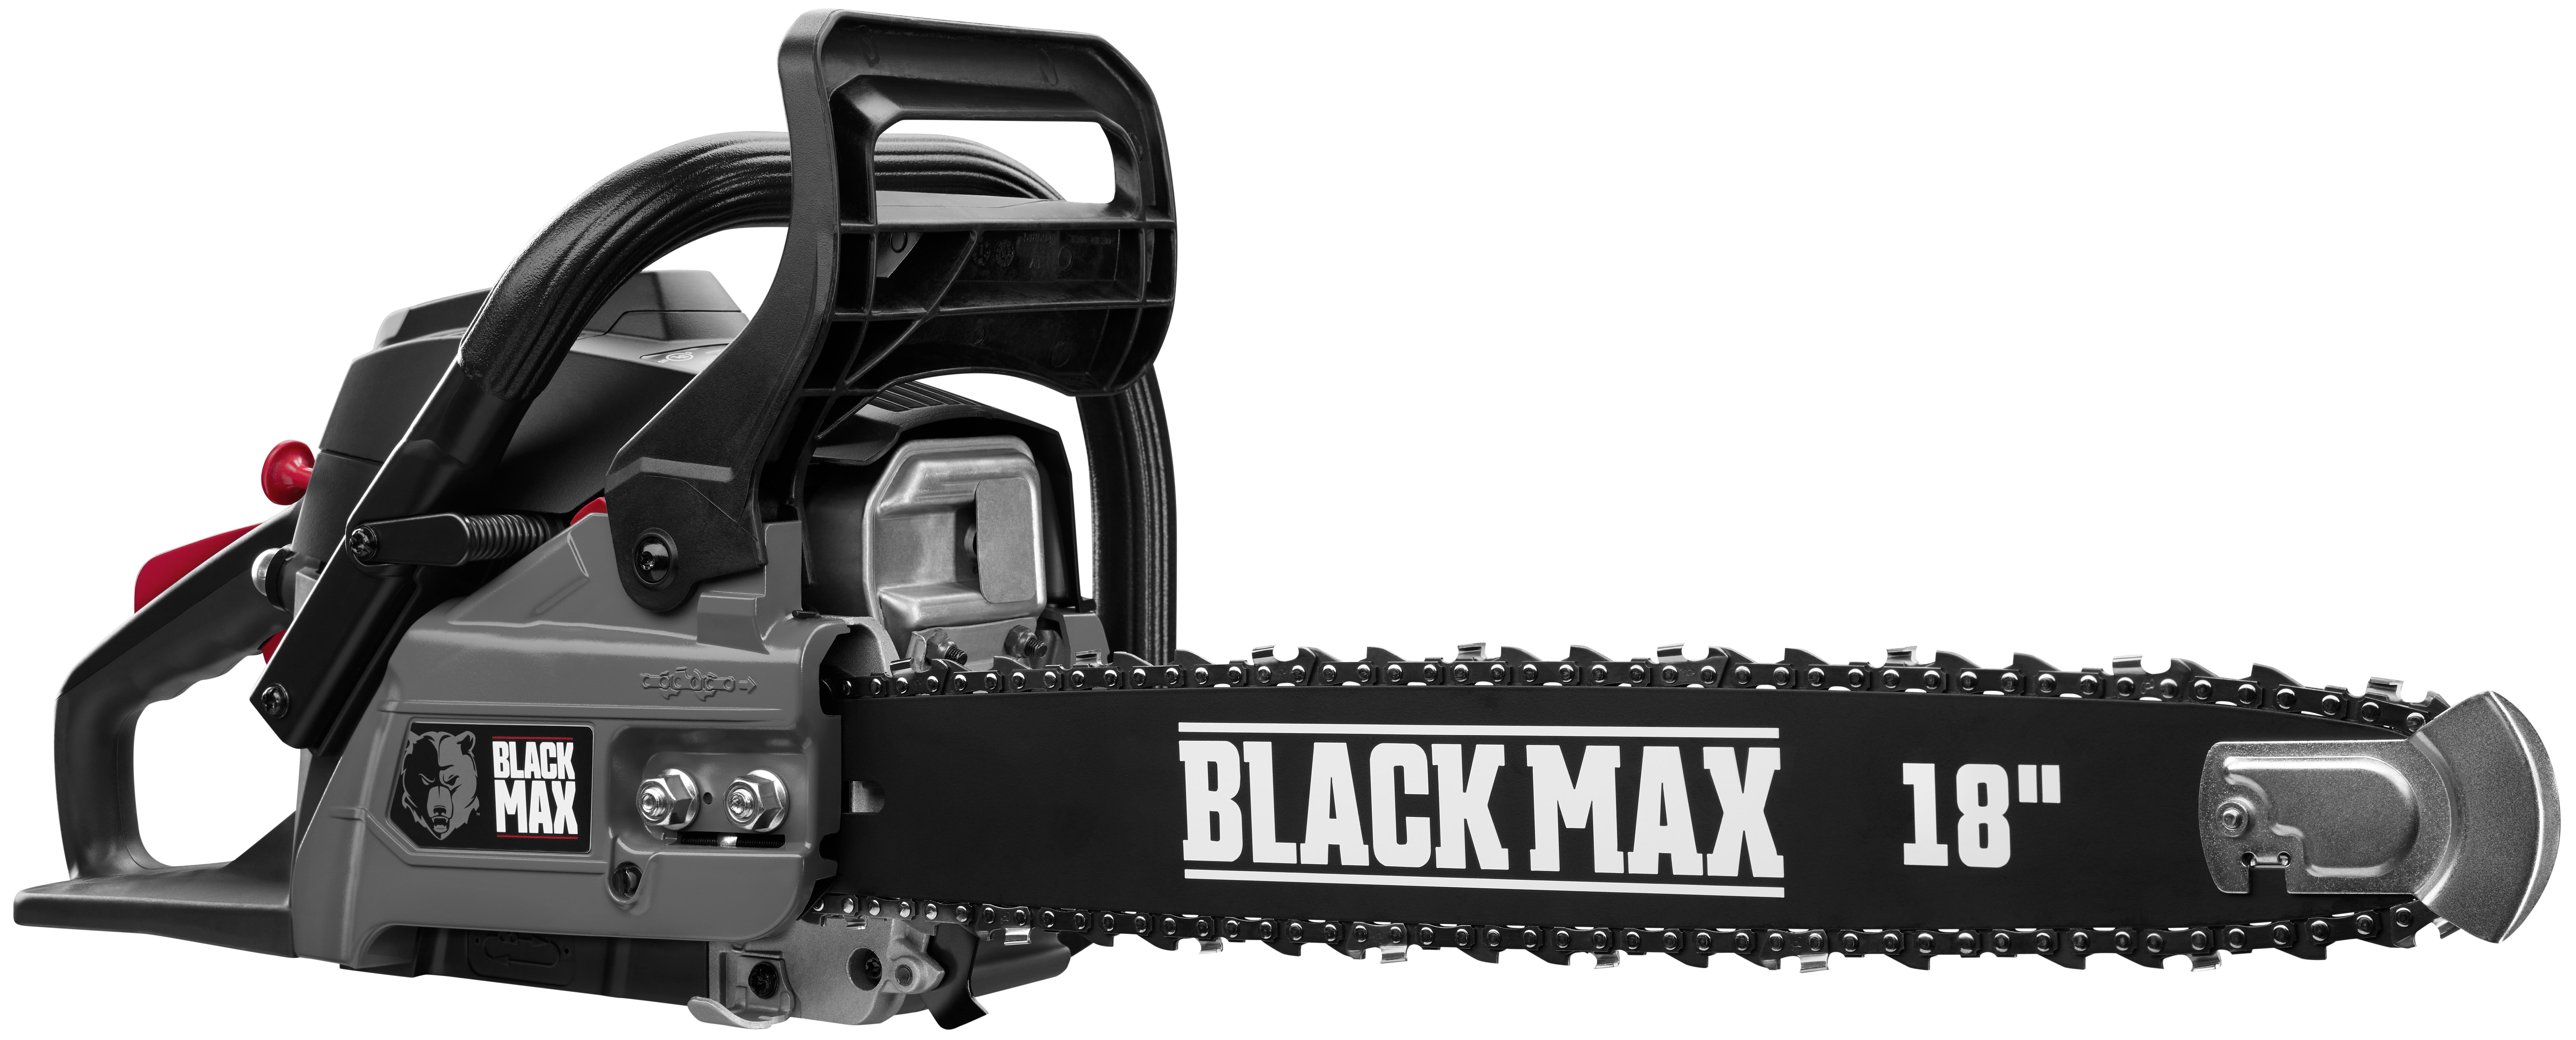 Black Max 38cc 2 Cycle Engine 18 Inch Gas Chainsaw Walmart Com Walmart Com